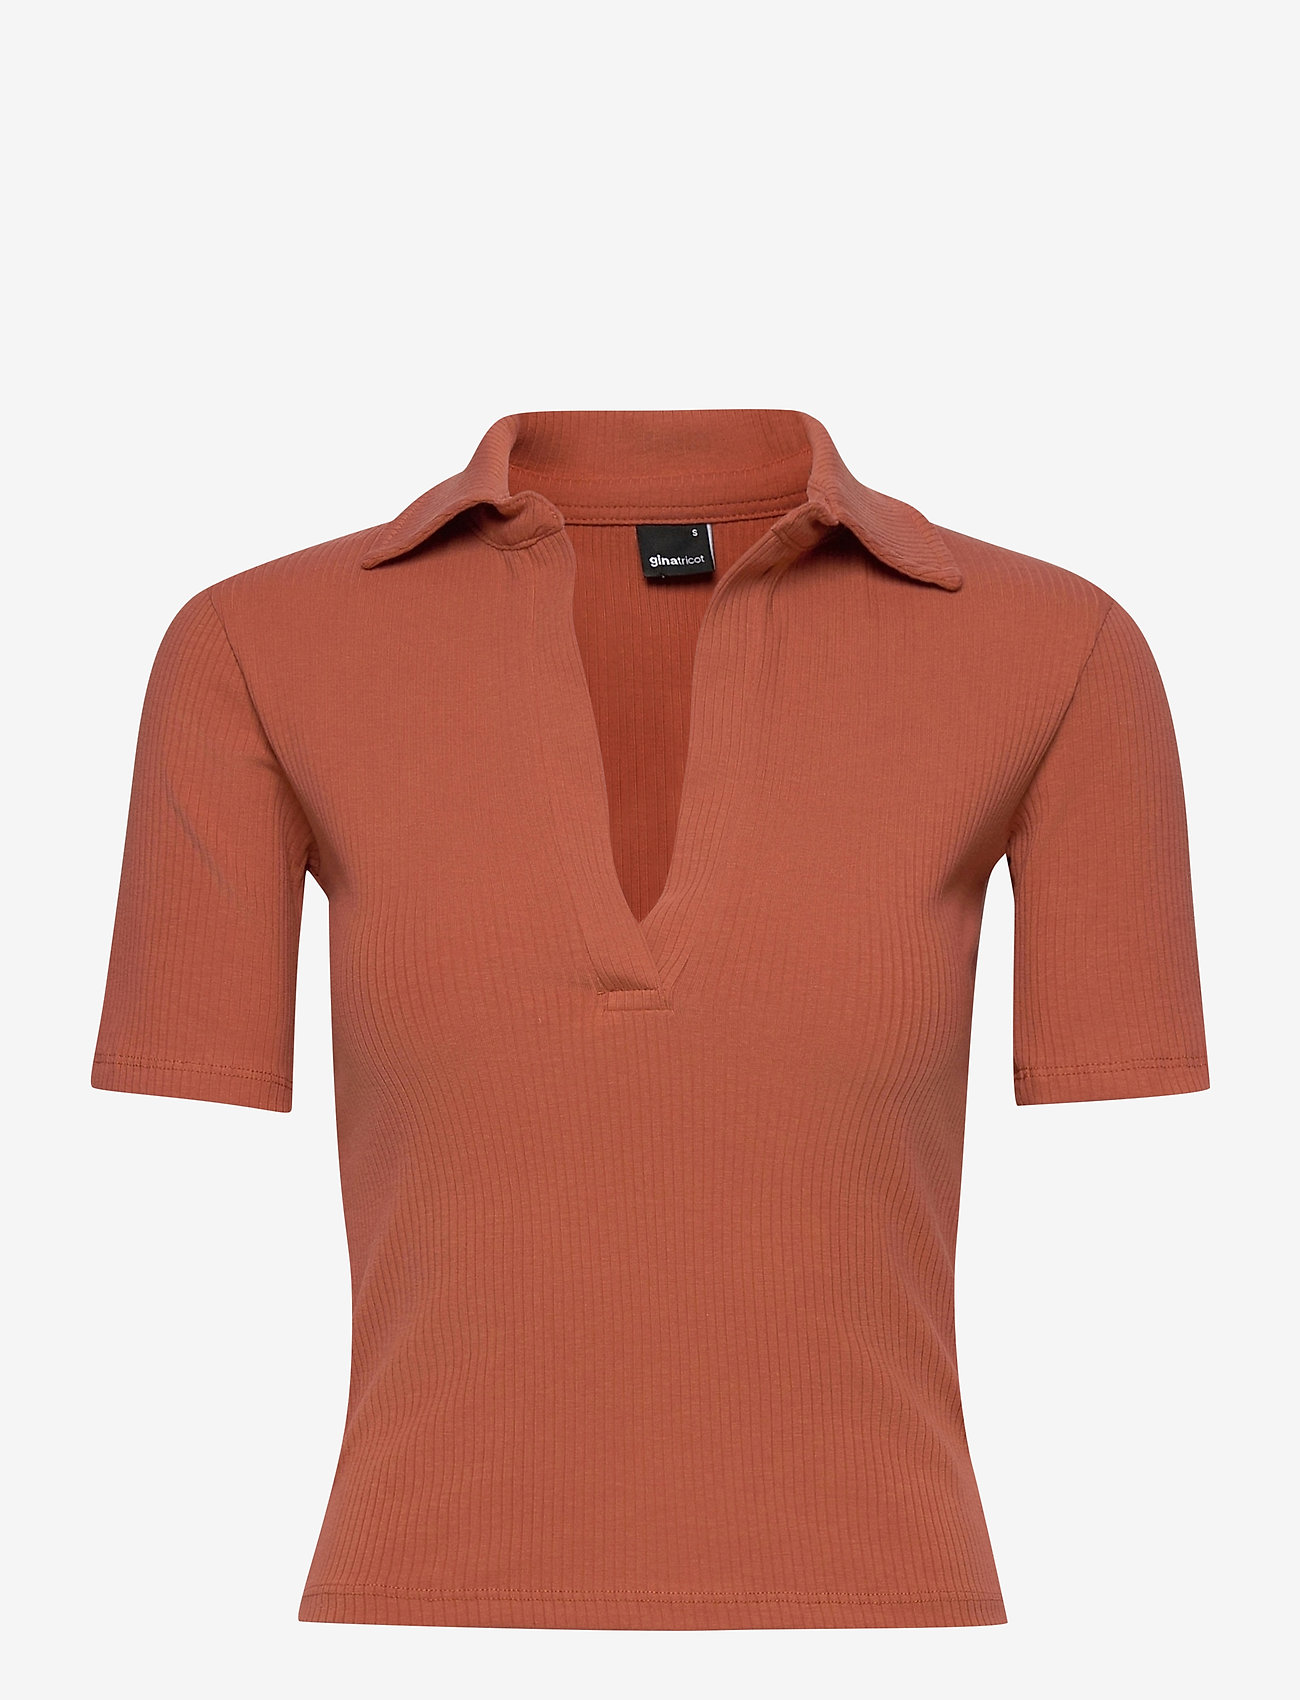 Gina Tricot - Klara top - t-shirts - chutney (2250) - 0